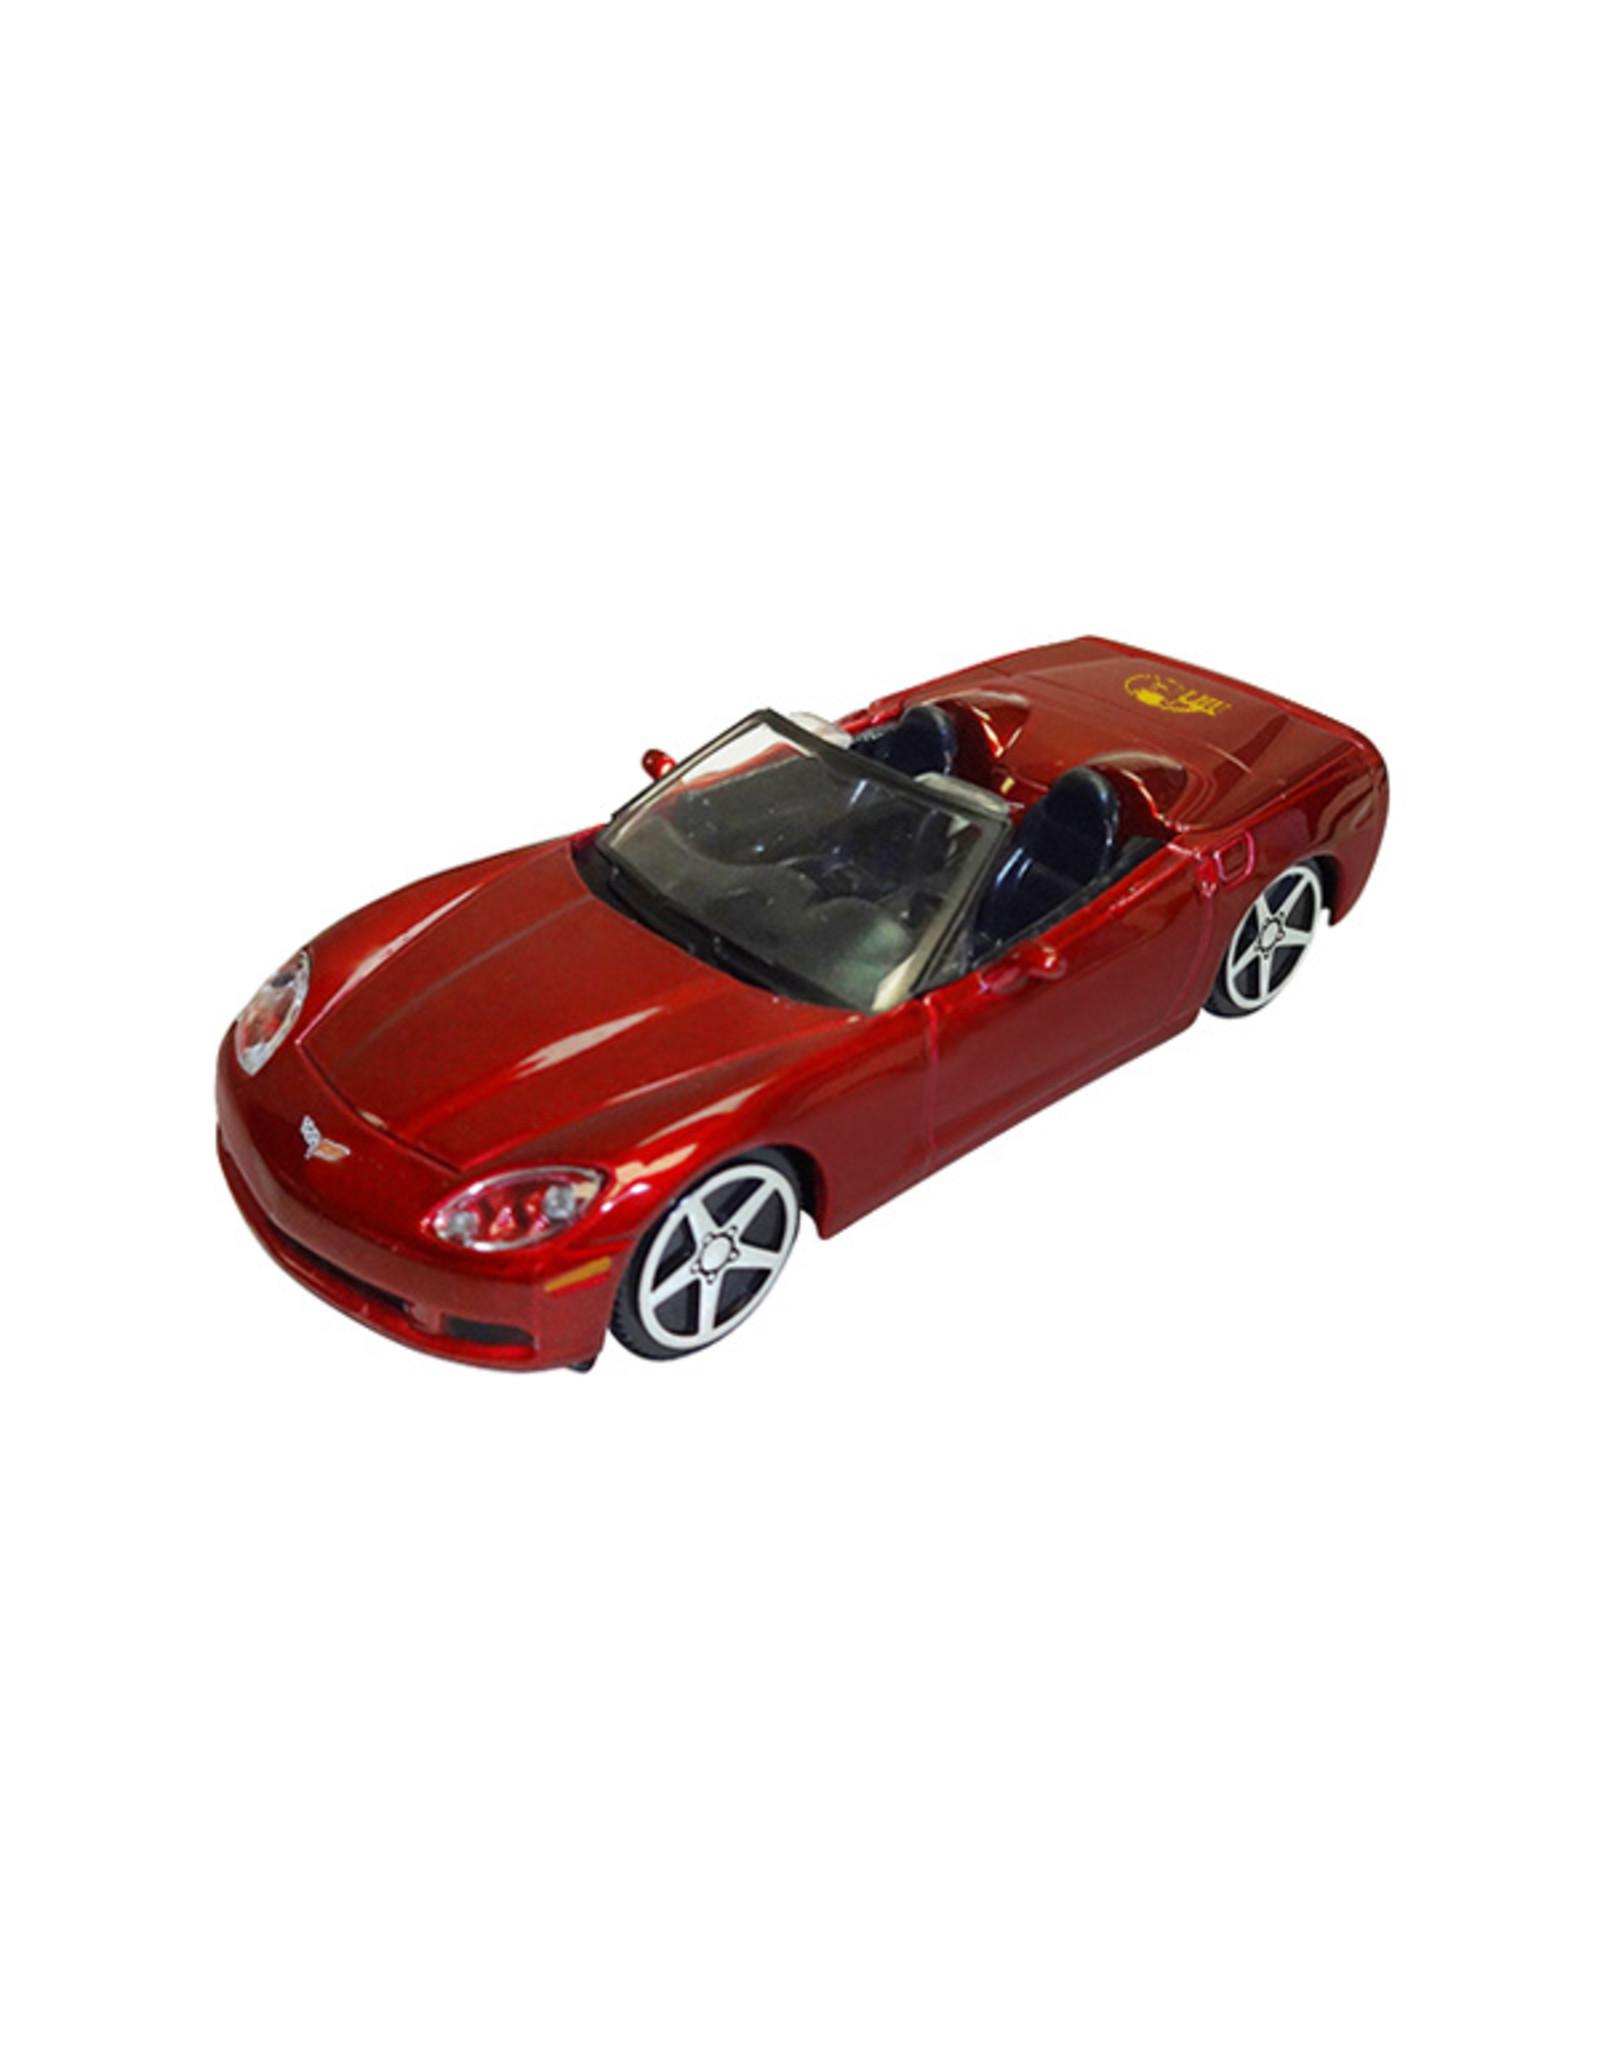 Chevrolet CHEVROLET CORVETTE CABRIO-2004(dark red metallic)